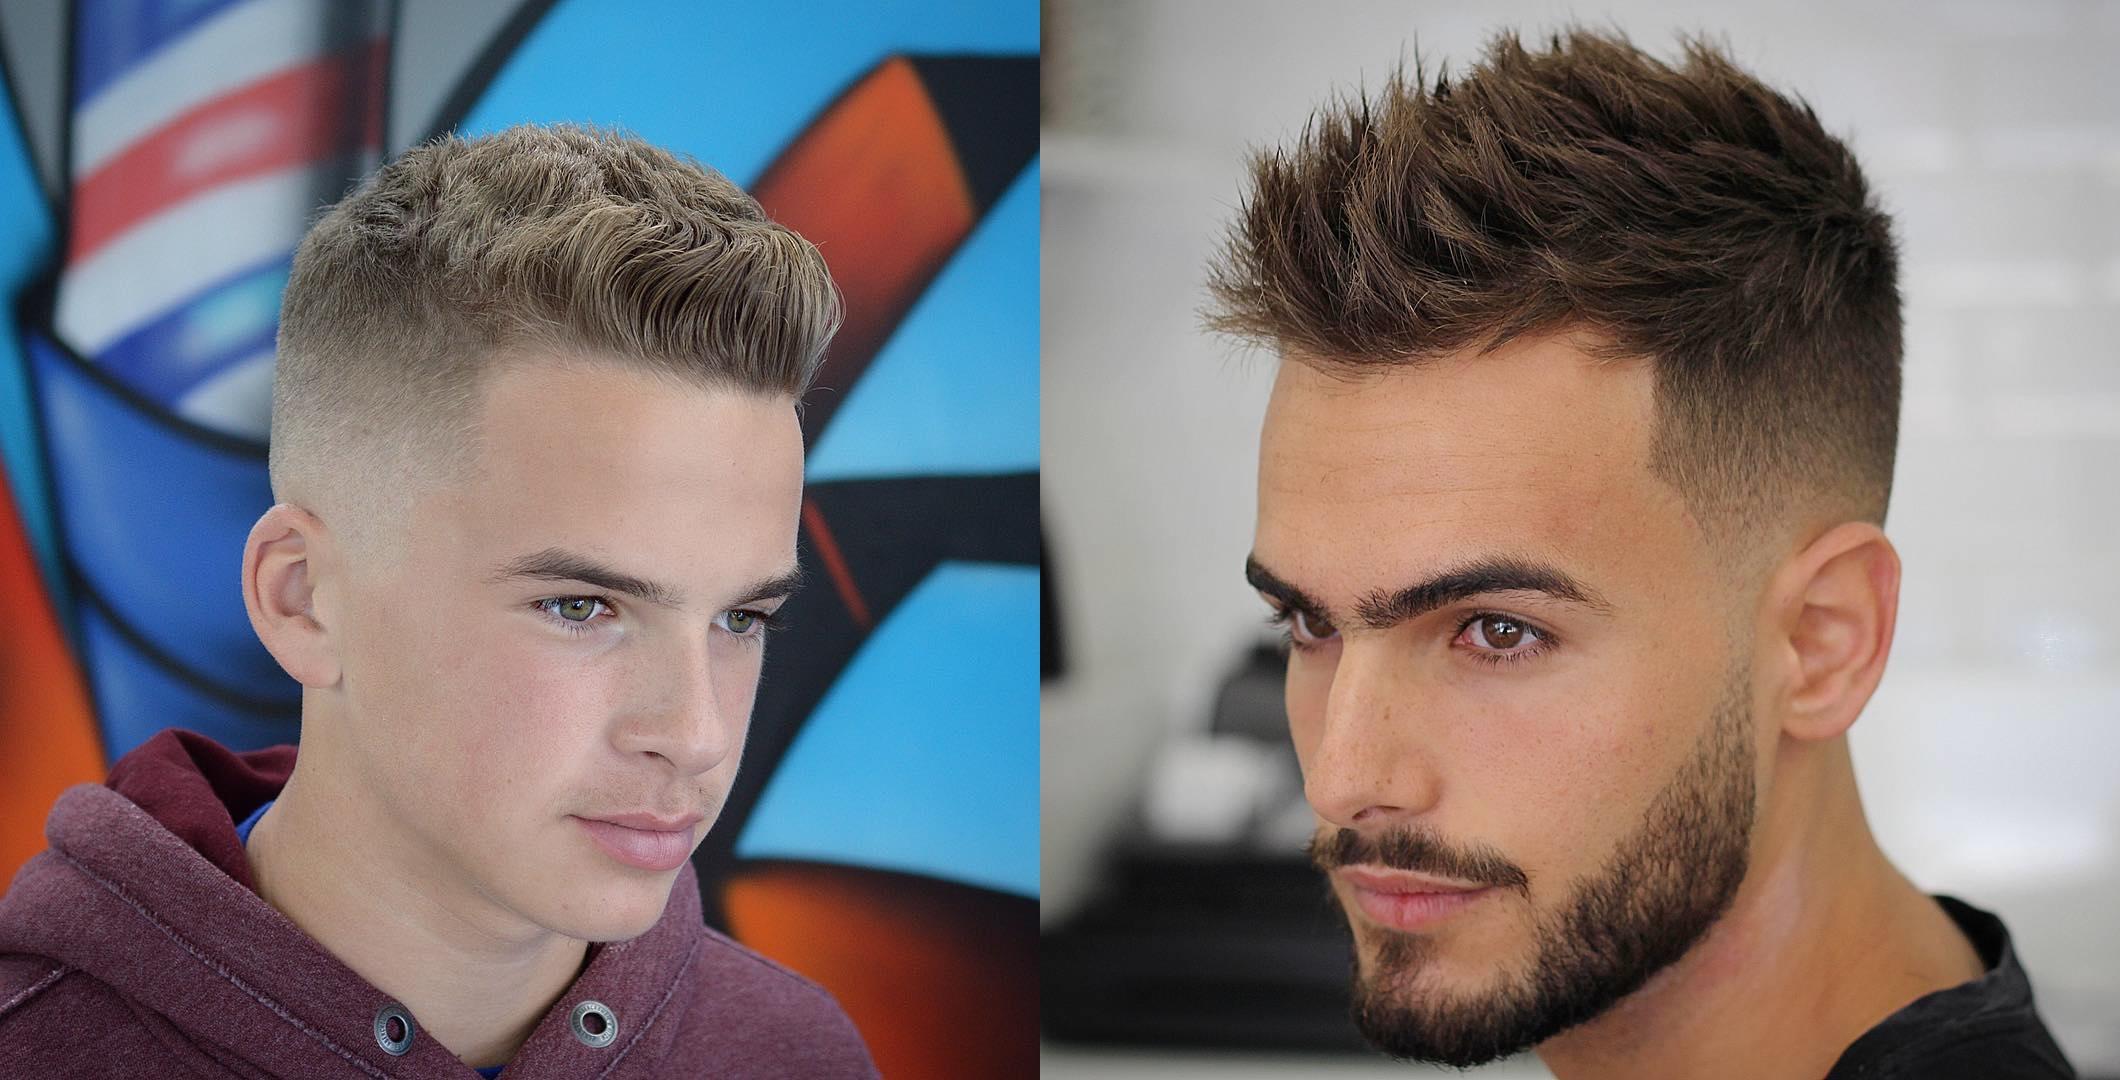 corte-de-cabelo-masculino-2017-cortes-2017-cabelo-masculino-2017-corte-2017-penteado-2017-corte-para-cabelo-curto-cabelo-curto-masculino-alex-cursino-moda-sem-censura-dicas-de-moda-7-horz